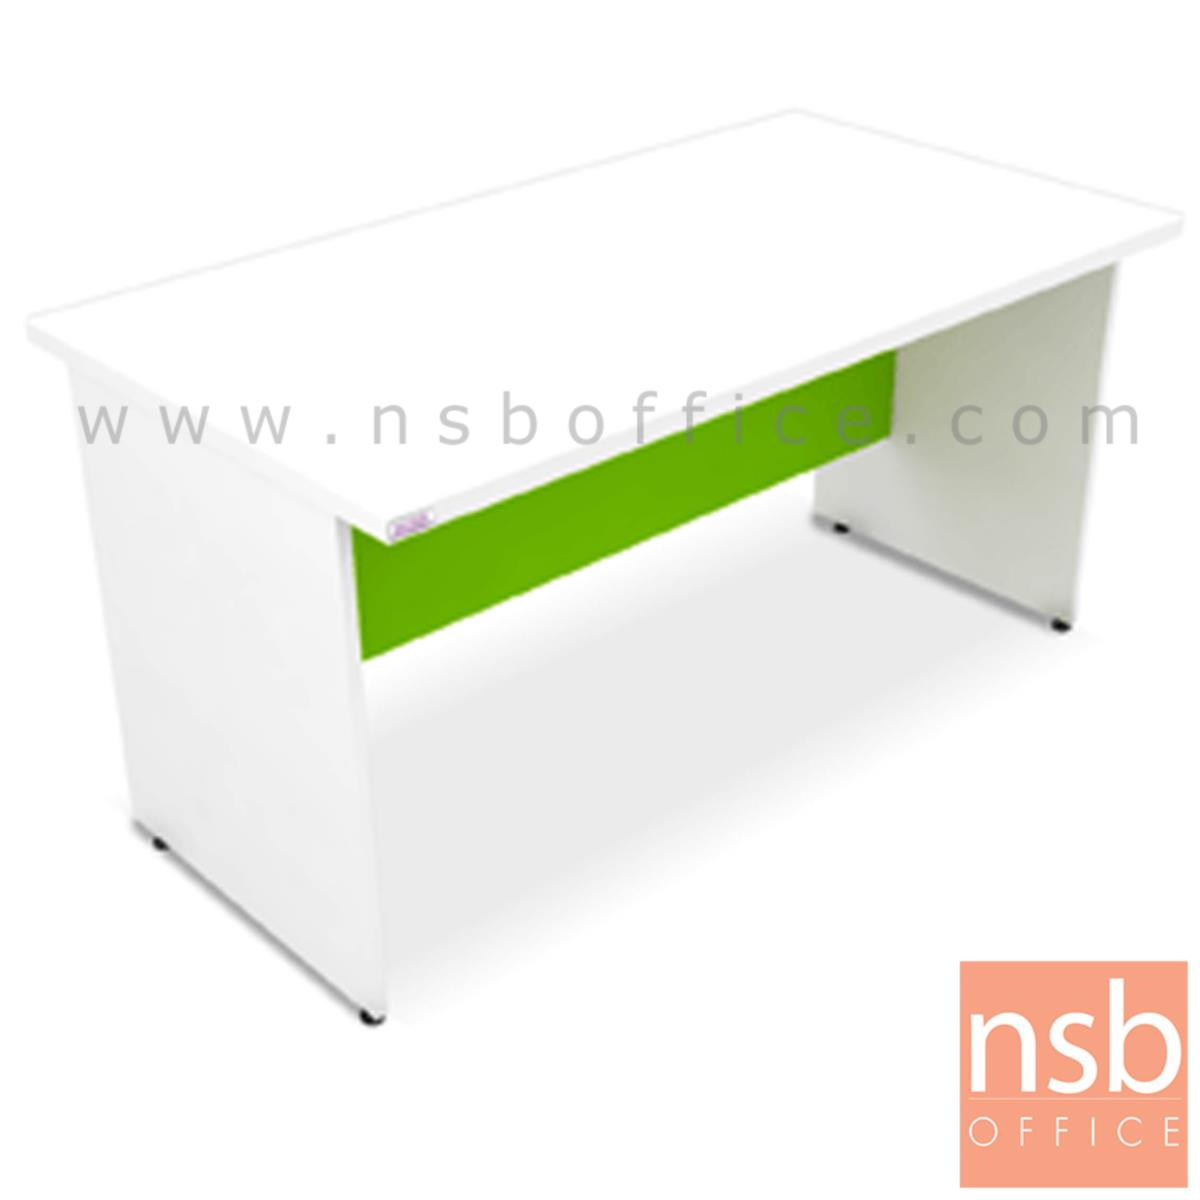 A20A001:โต๊ะทำงานสีสัน รุ่น MT-COLOUR-OPEN ขนาด 120W ,150W cm.